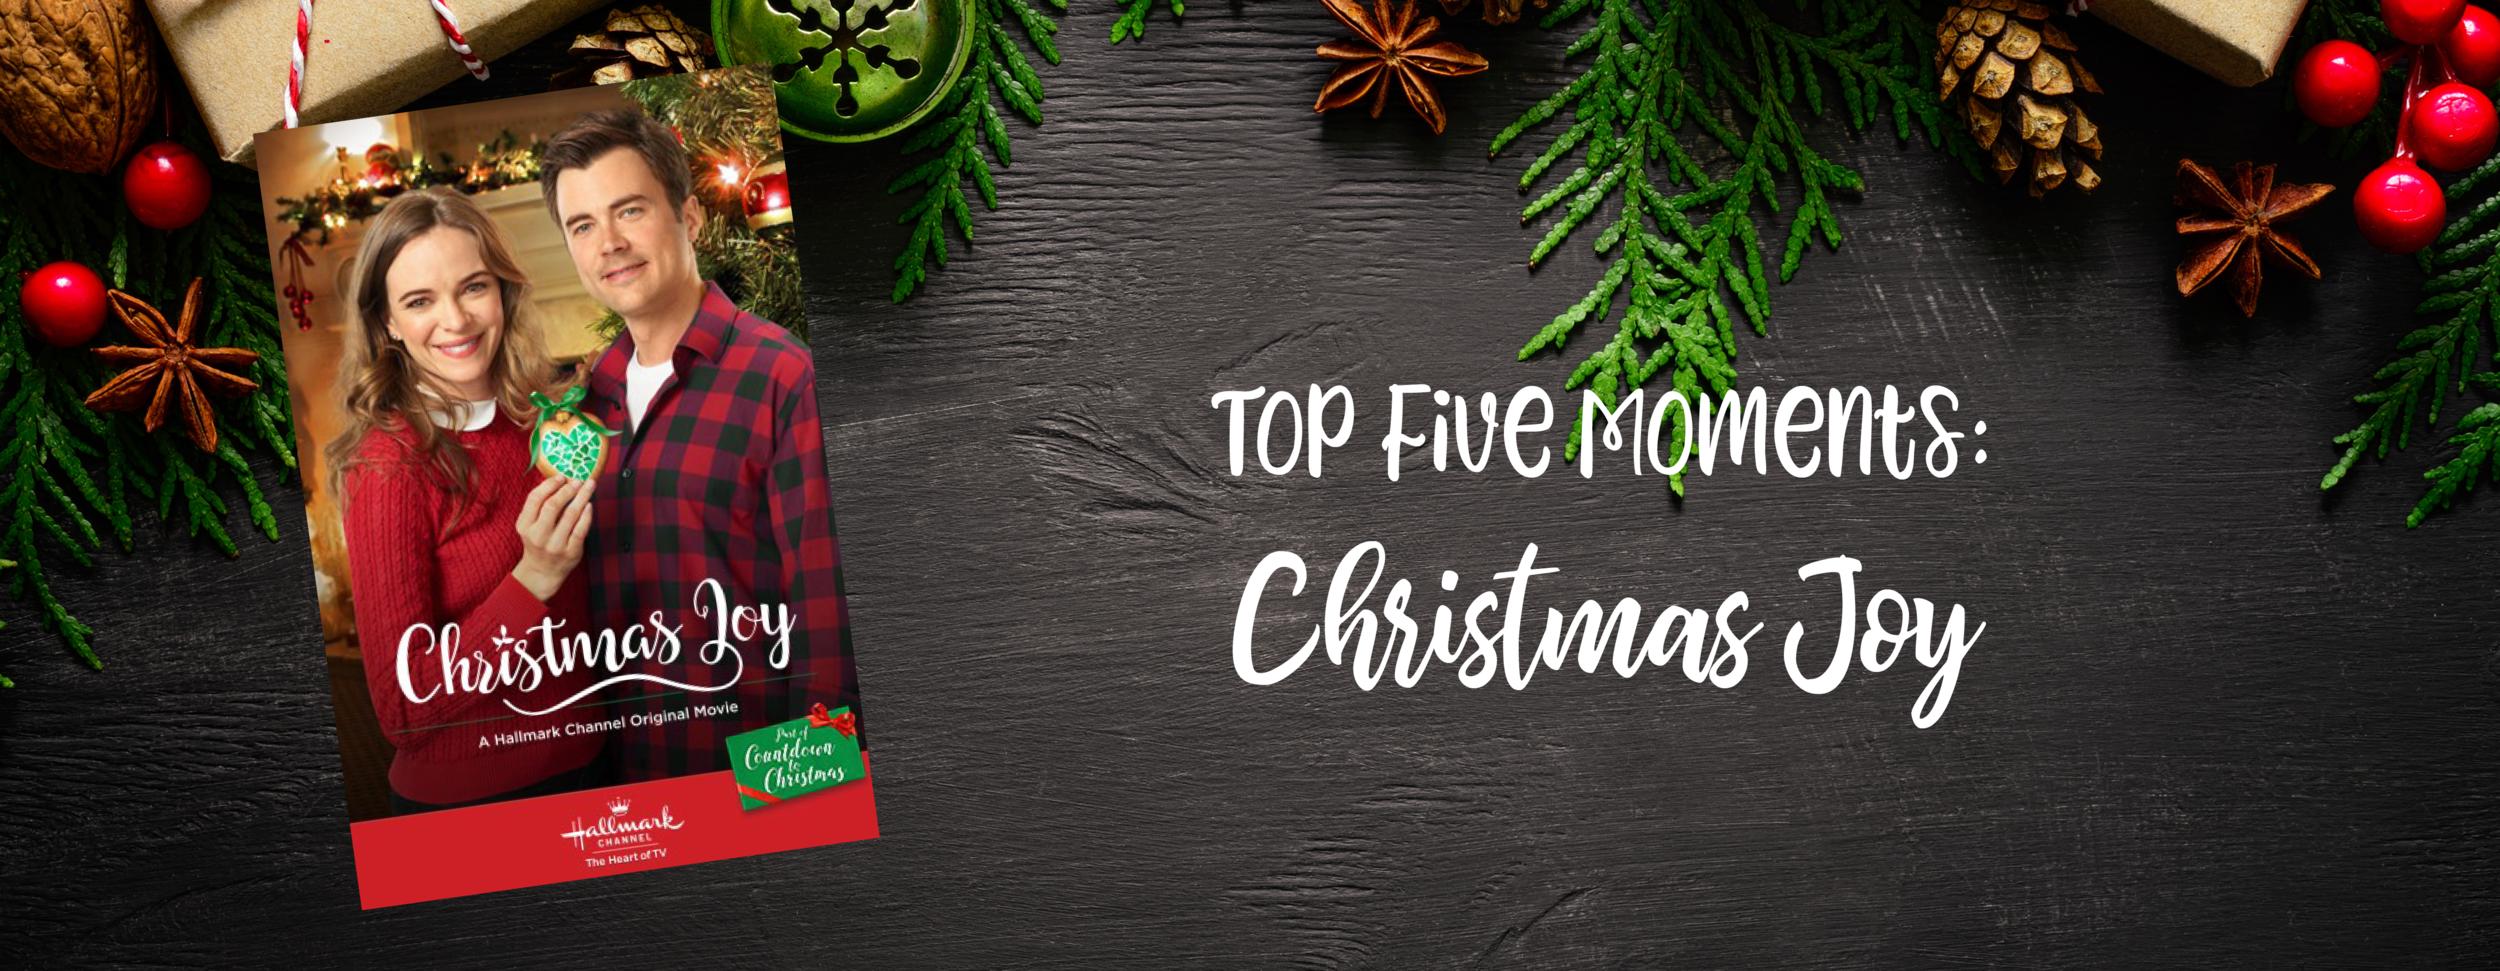 Christmas Joy blog header.png